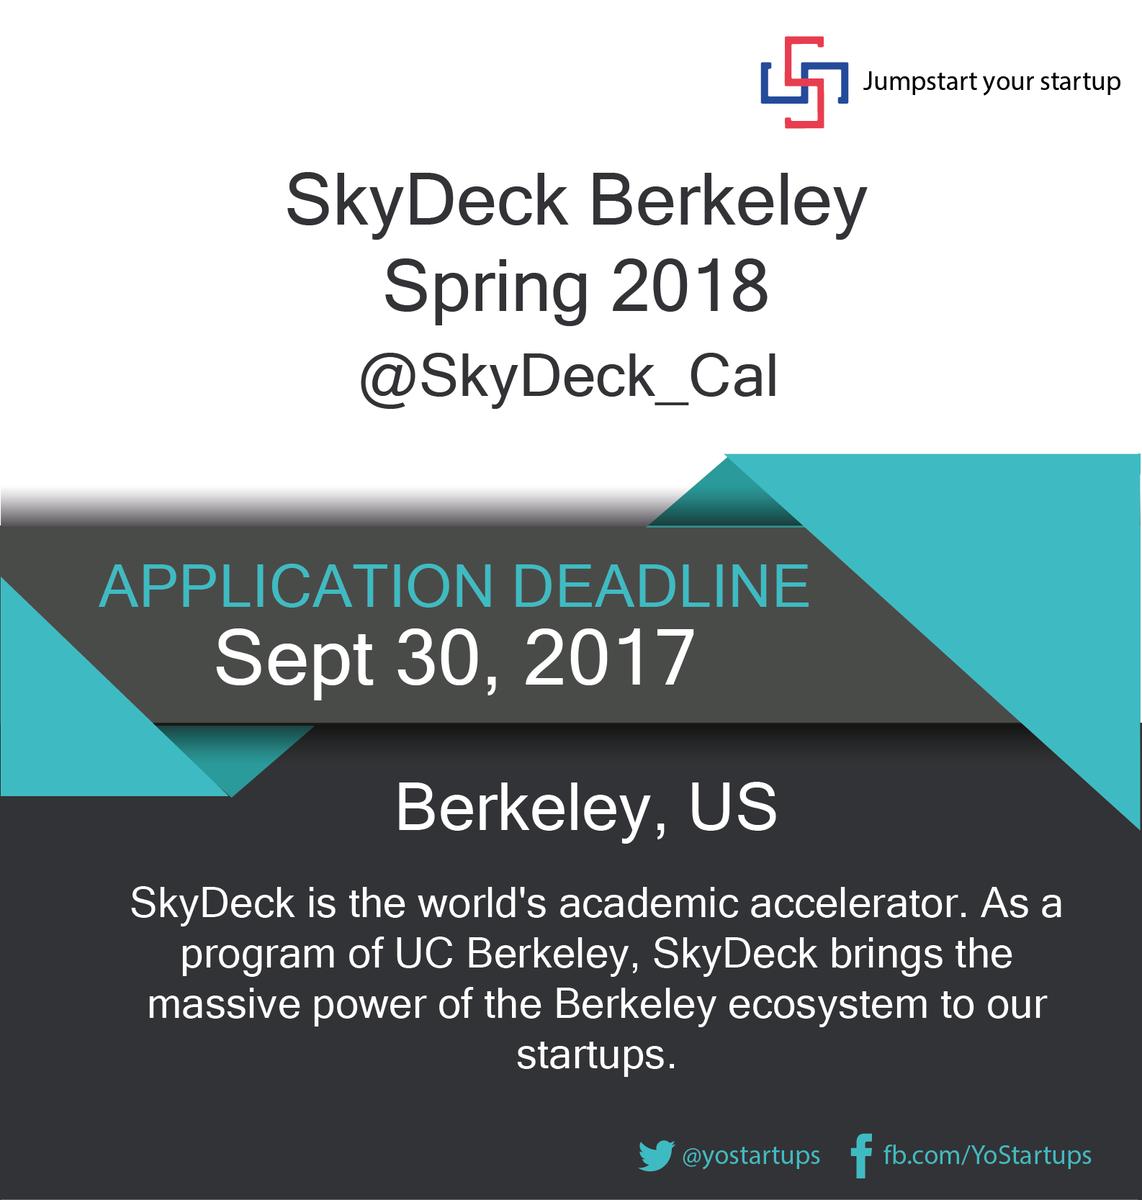 Checkout @SkyDeck_Cal bringing massive power of the Berkeley ecosystem to the #startups #accelerator #YoStartups  https:// goo.gl/F6Vhi7  &nbsp;  <br>http://pic.twitter.com/6exK0vAItC